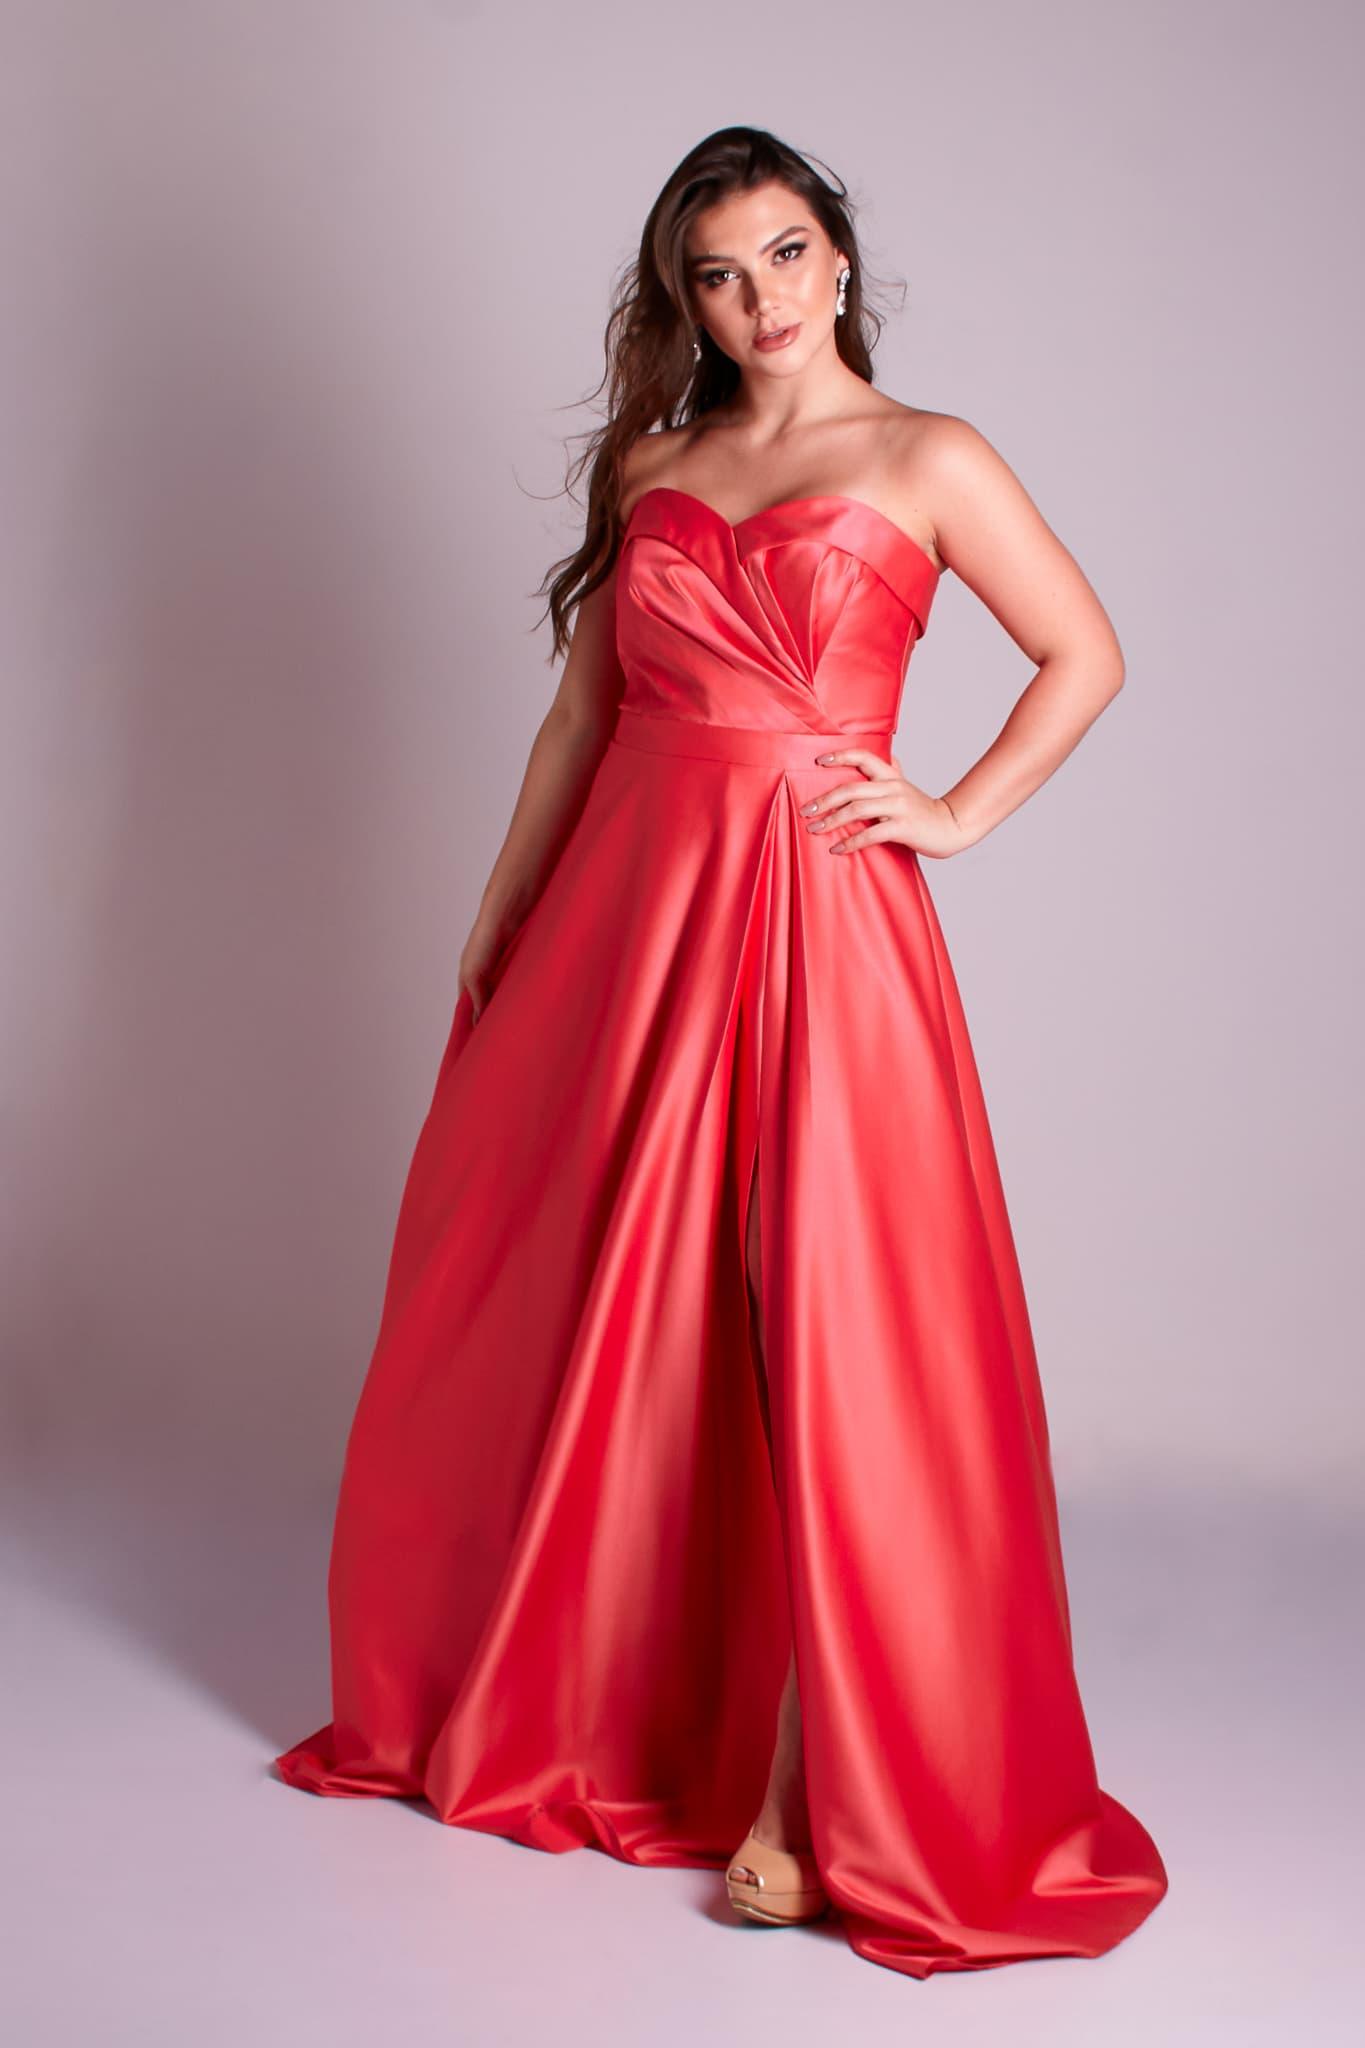 25 - vestido coral ou rosa chiclete de zibeline com fenda